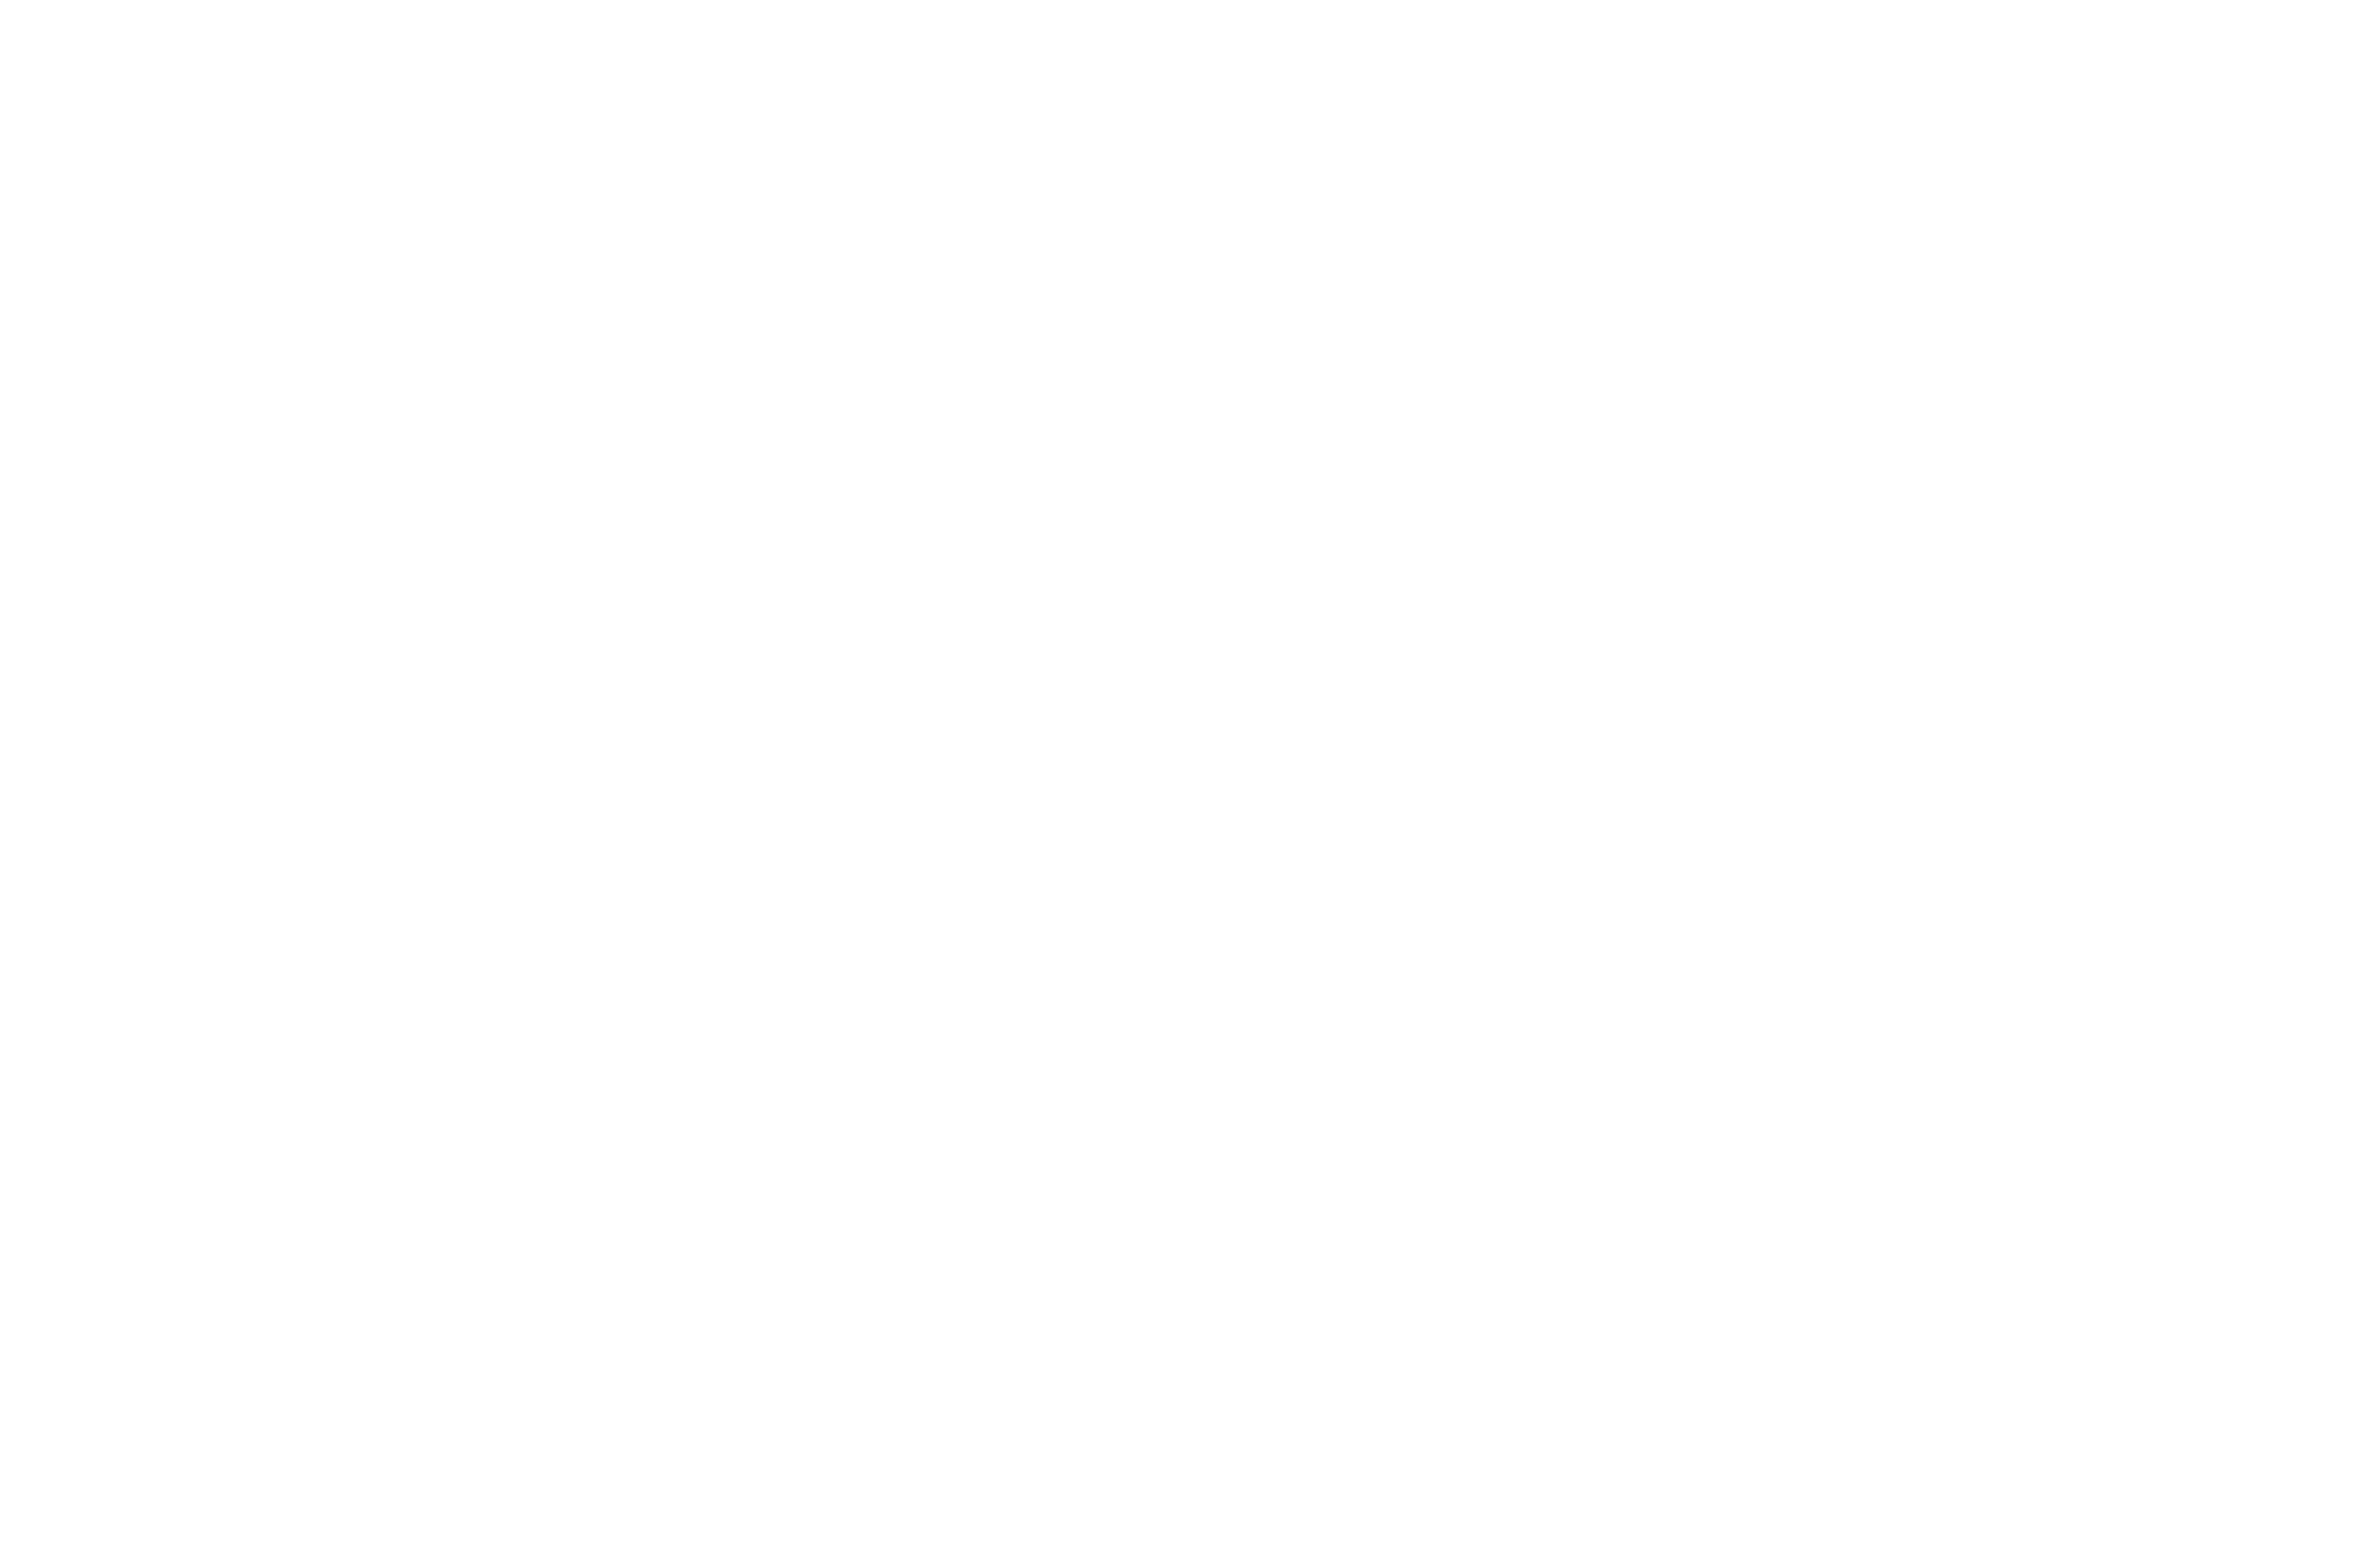 b14b0b523637b5638bf4c87df0b0d87e.png